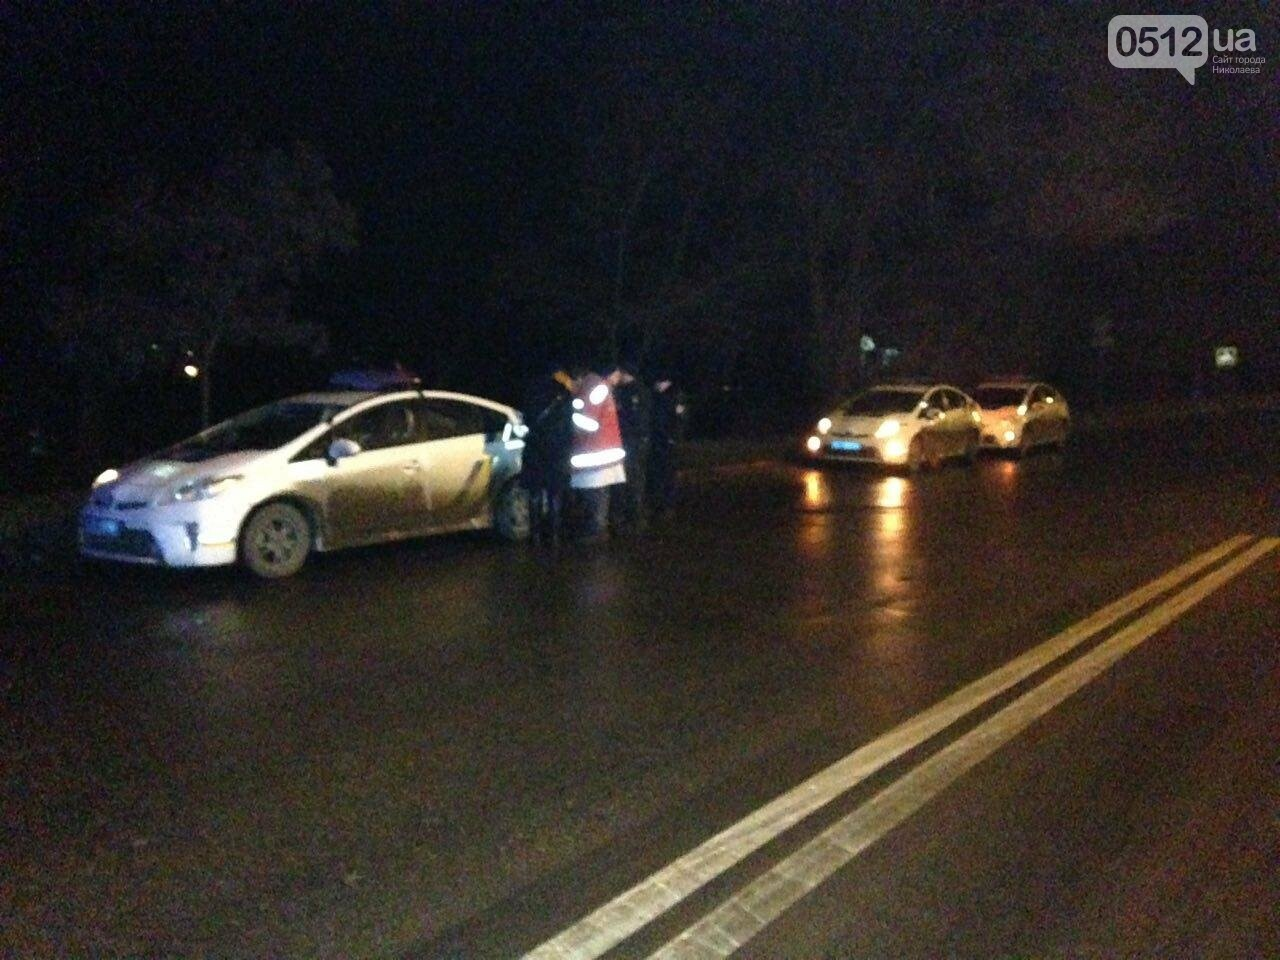 Страшное ДТП в Николаеве: 2 парня и 2 девушки на Мазде влетели в дерево - водитель умер на месте аварии, - ФОТО, фото-3